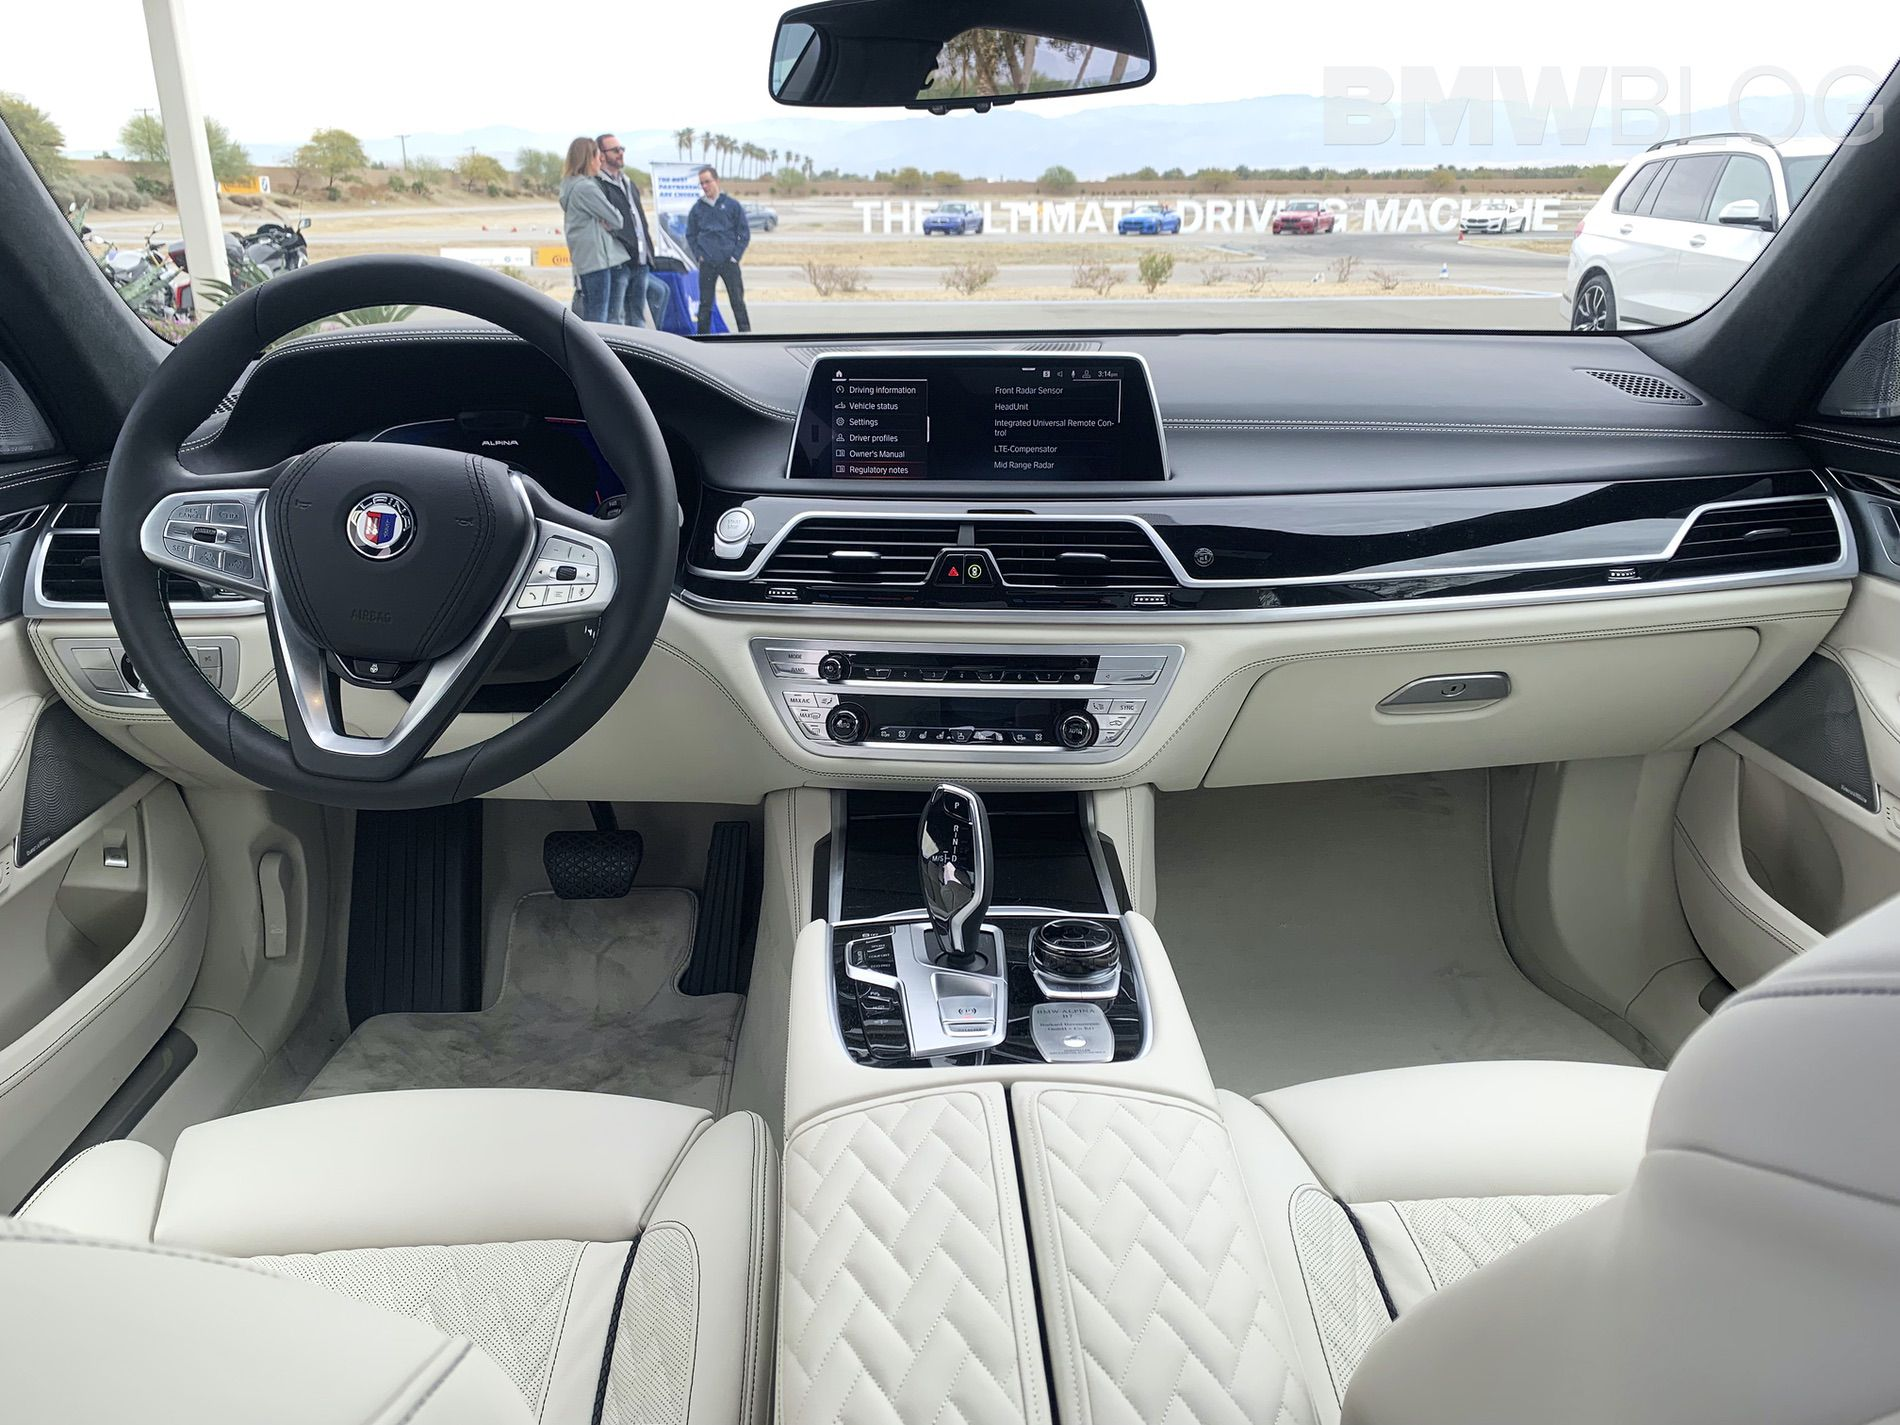 2019 - [BMW] Série 7 restylée  - Page 12 2020-ALPINA-B7-Facelift-09